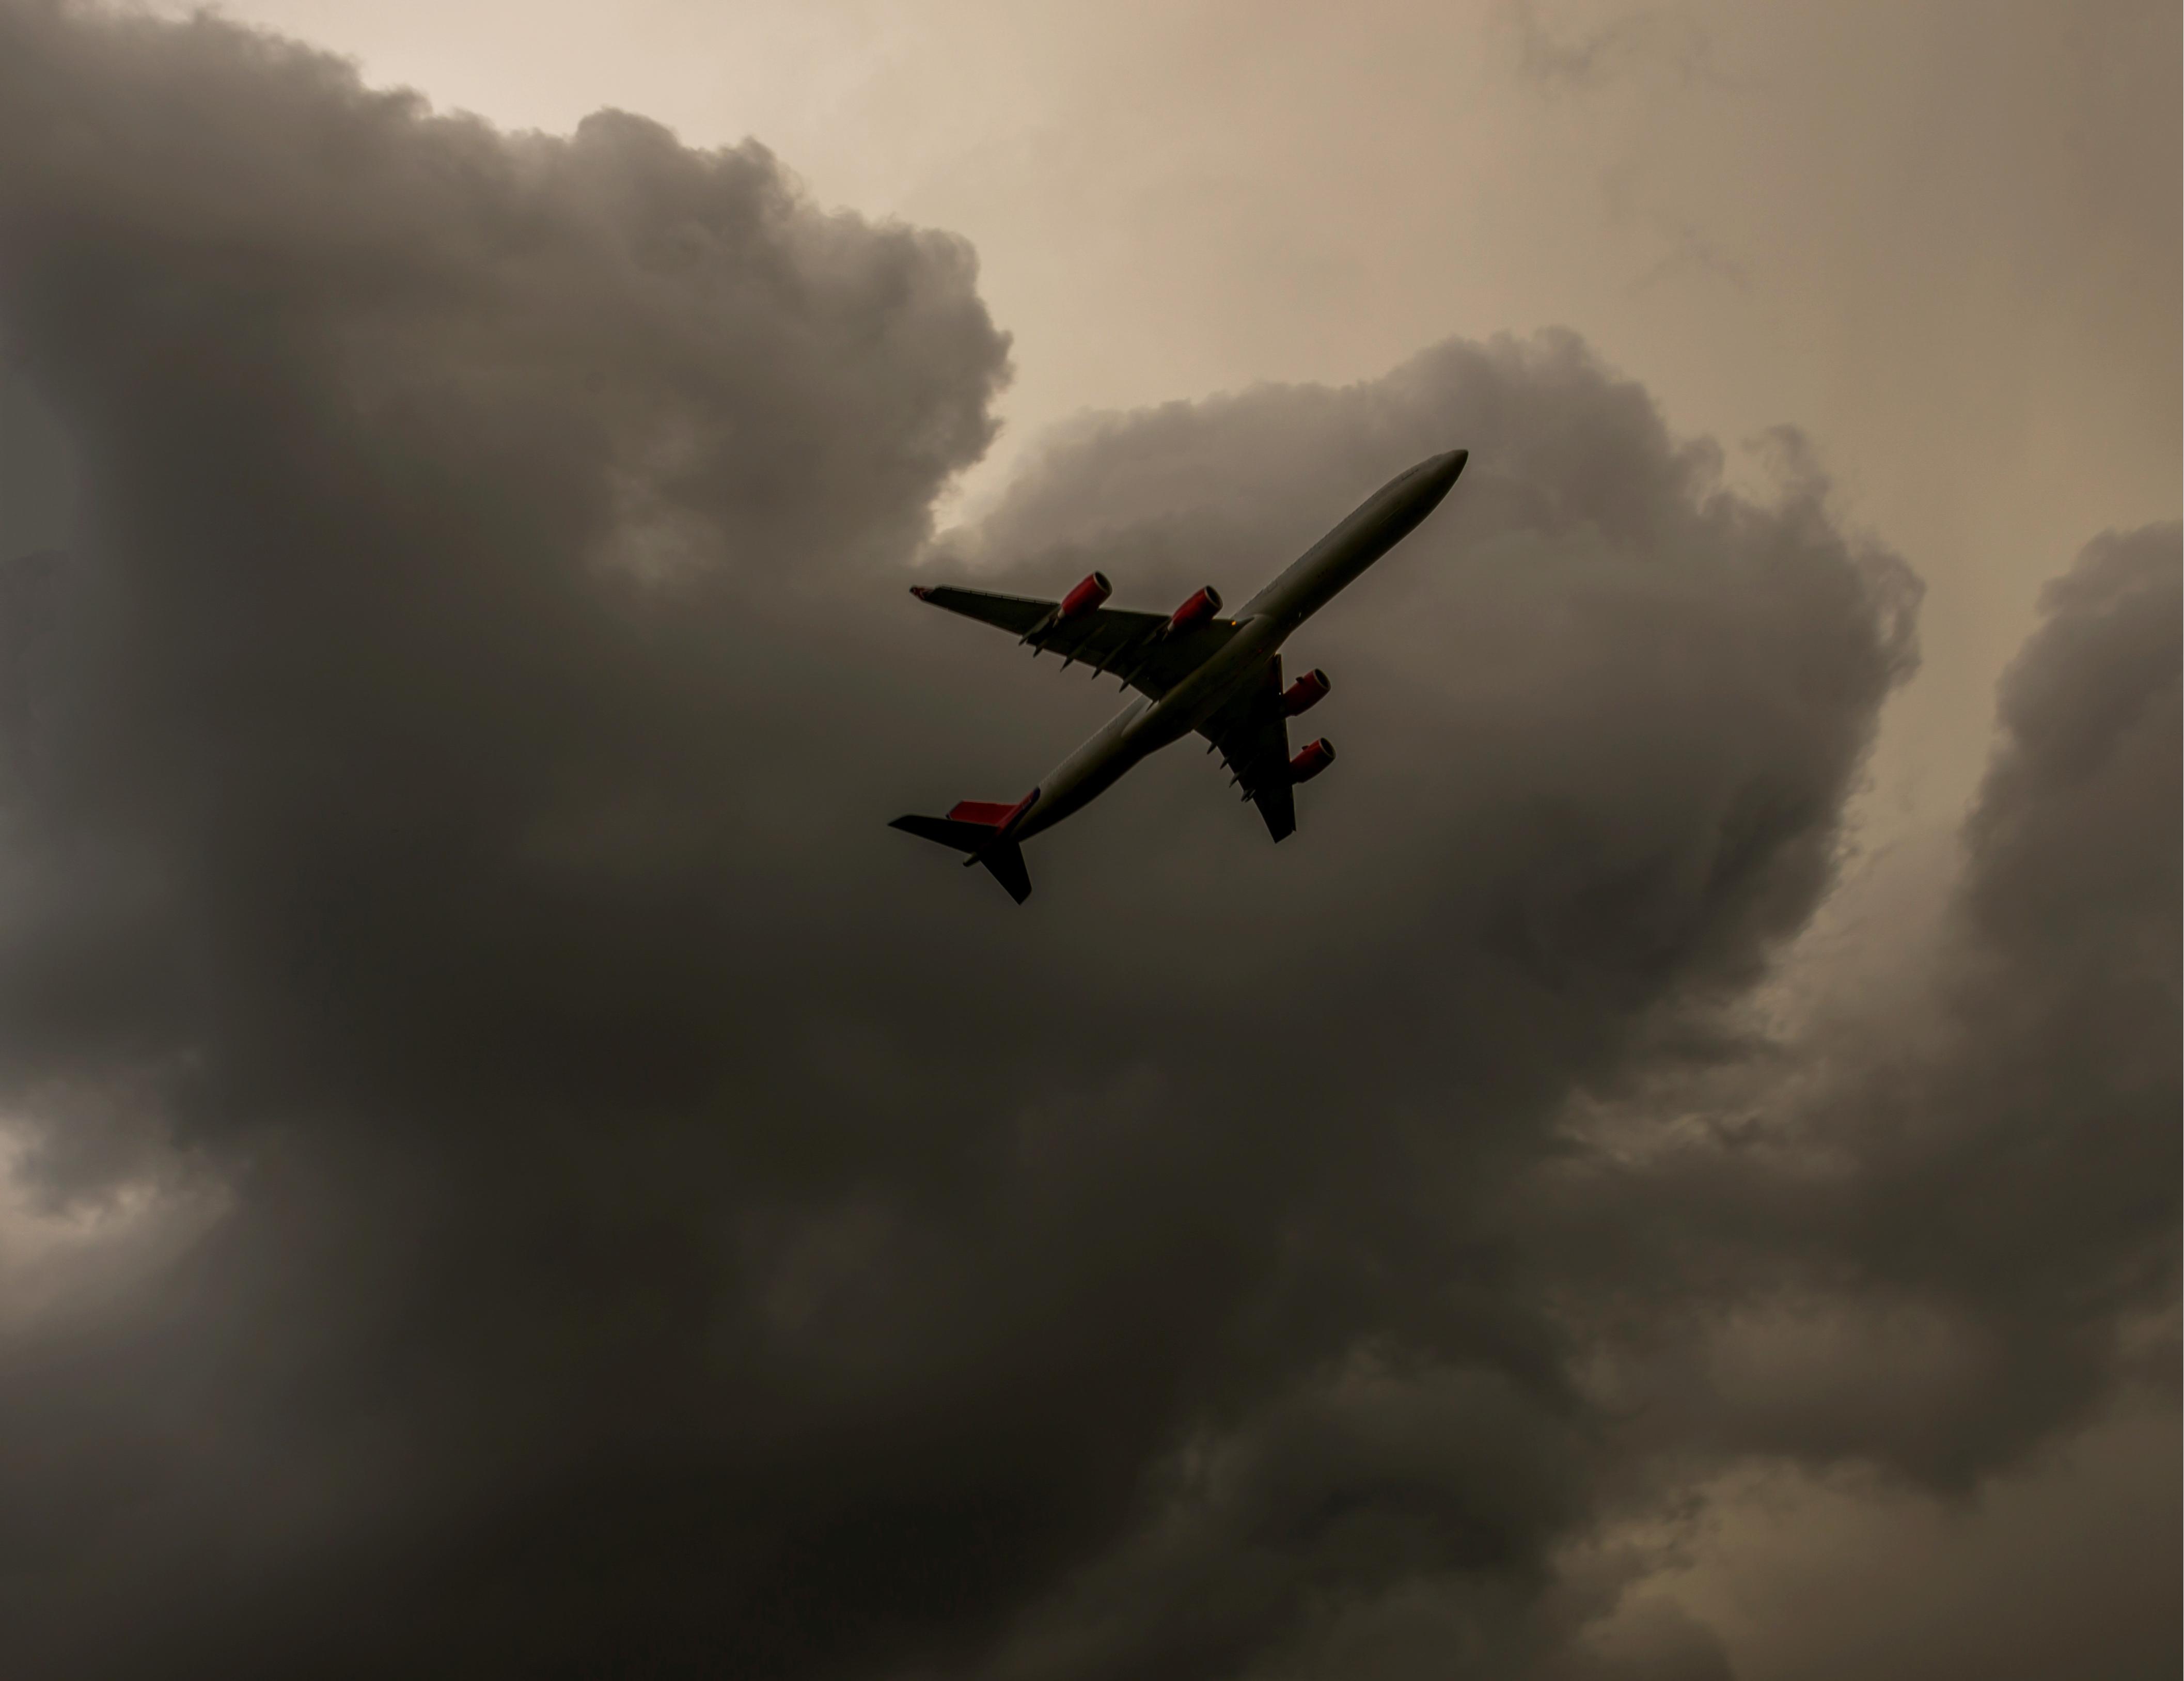 Flugzeug_Content_Q77photo_Shutterstock.jpg